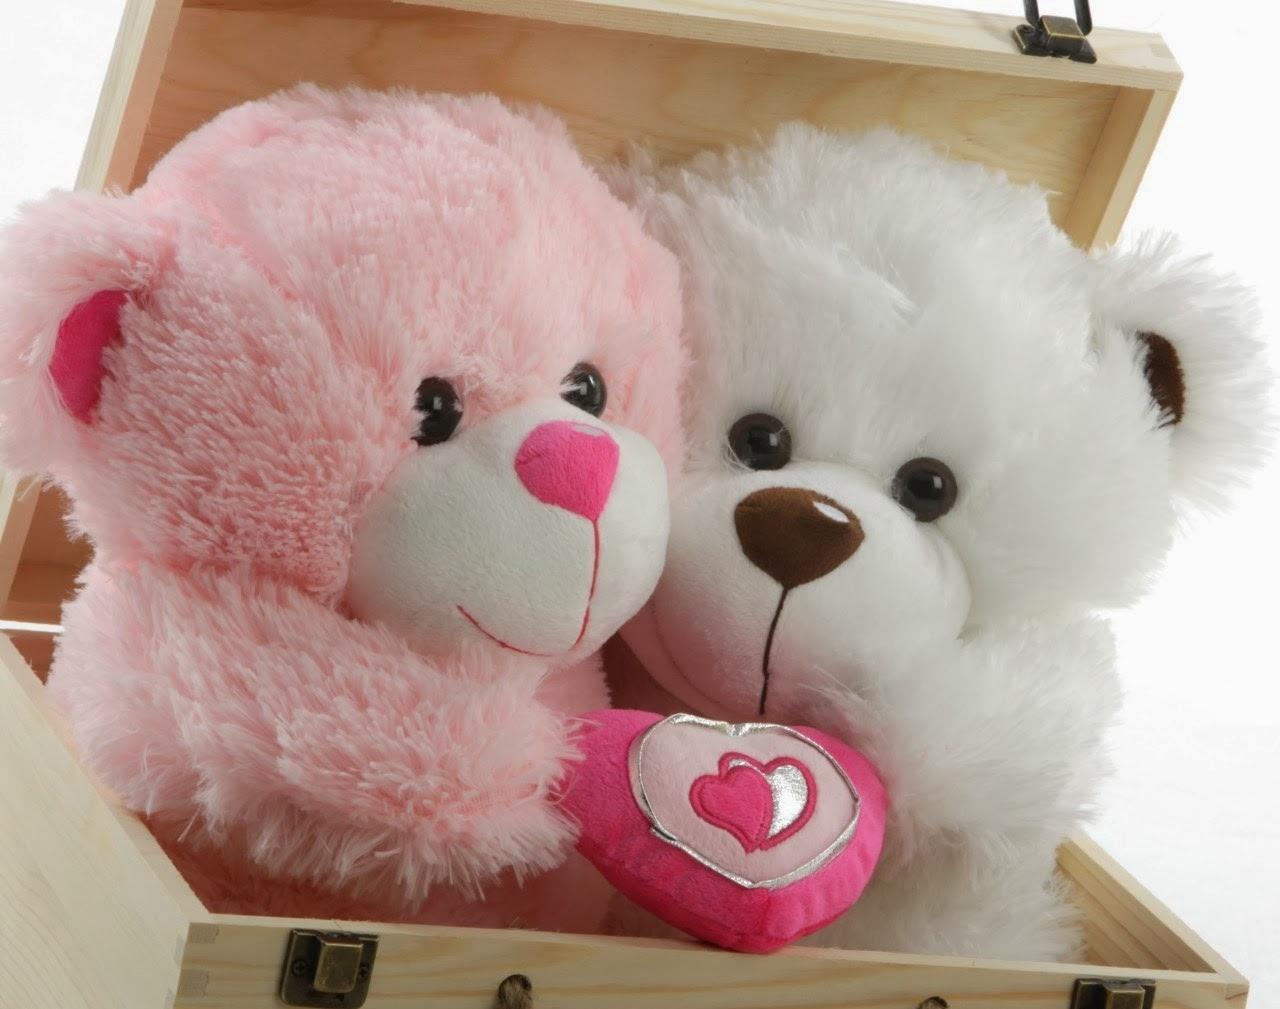 http://cute-photozone.blogspot.com/2015/01/most-romantic-fb-cover-photos-2015.html